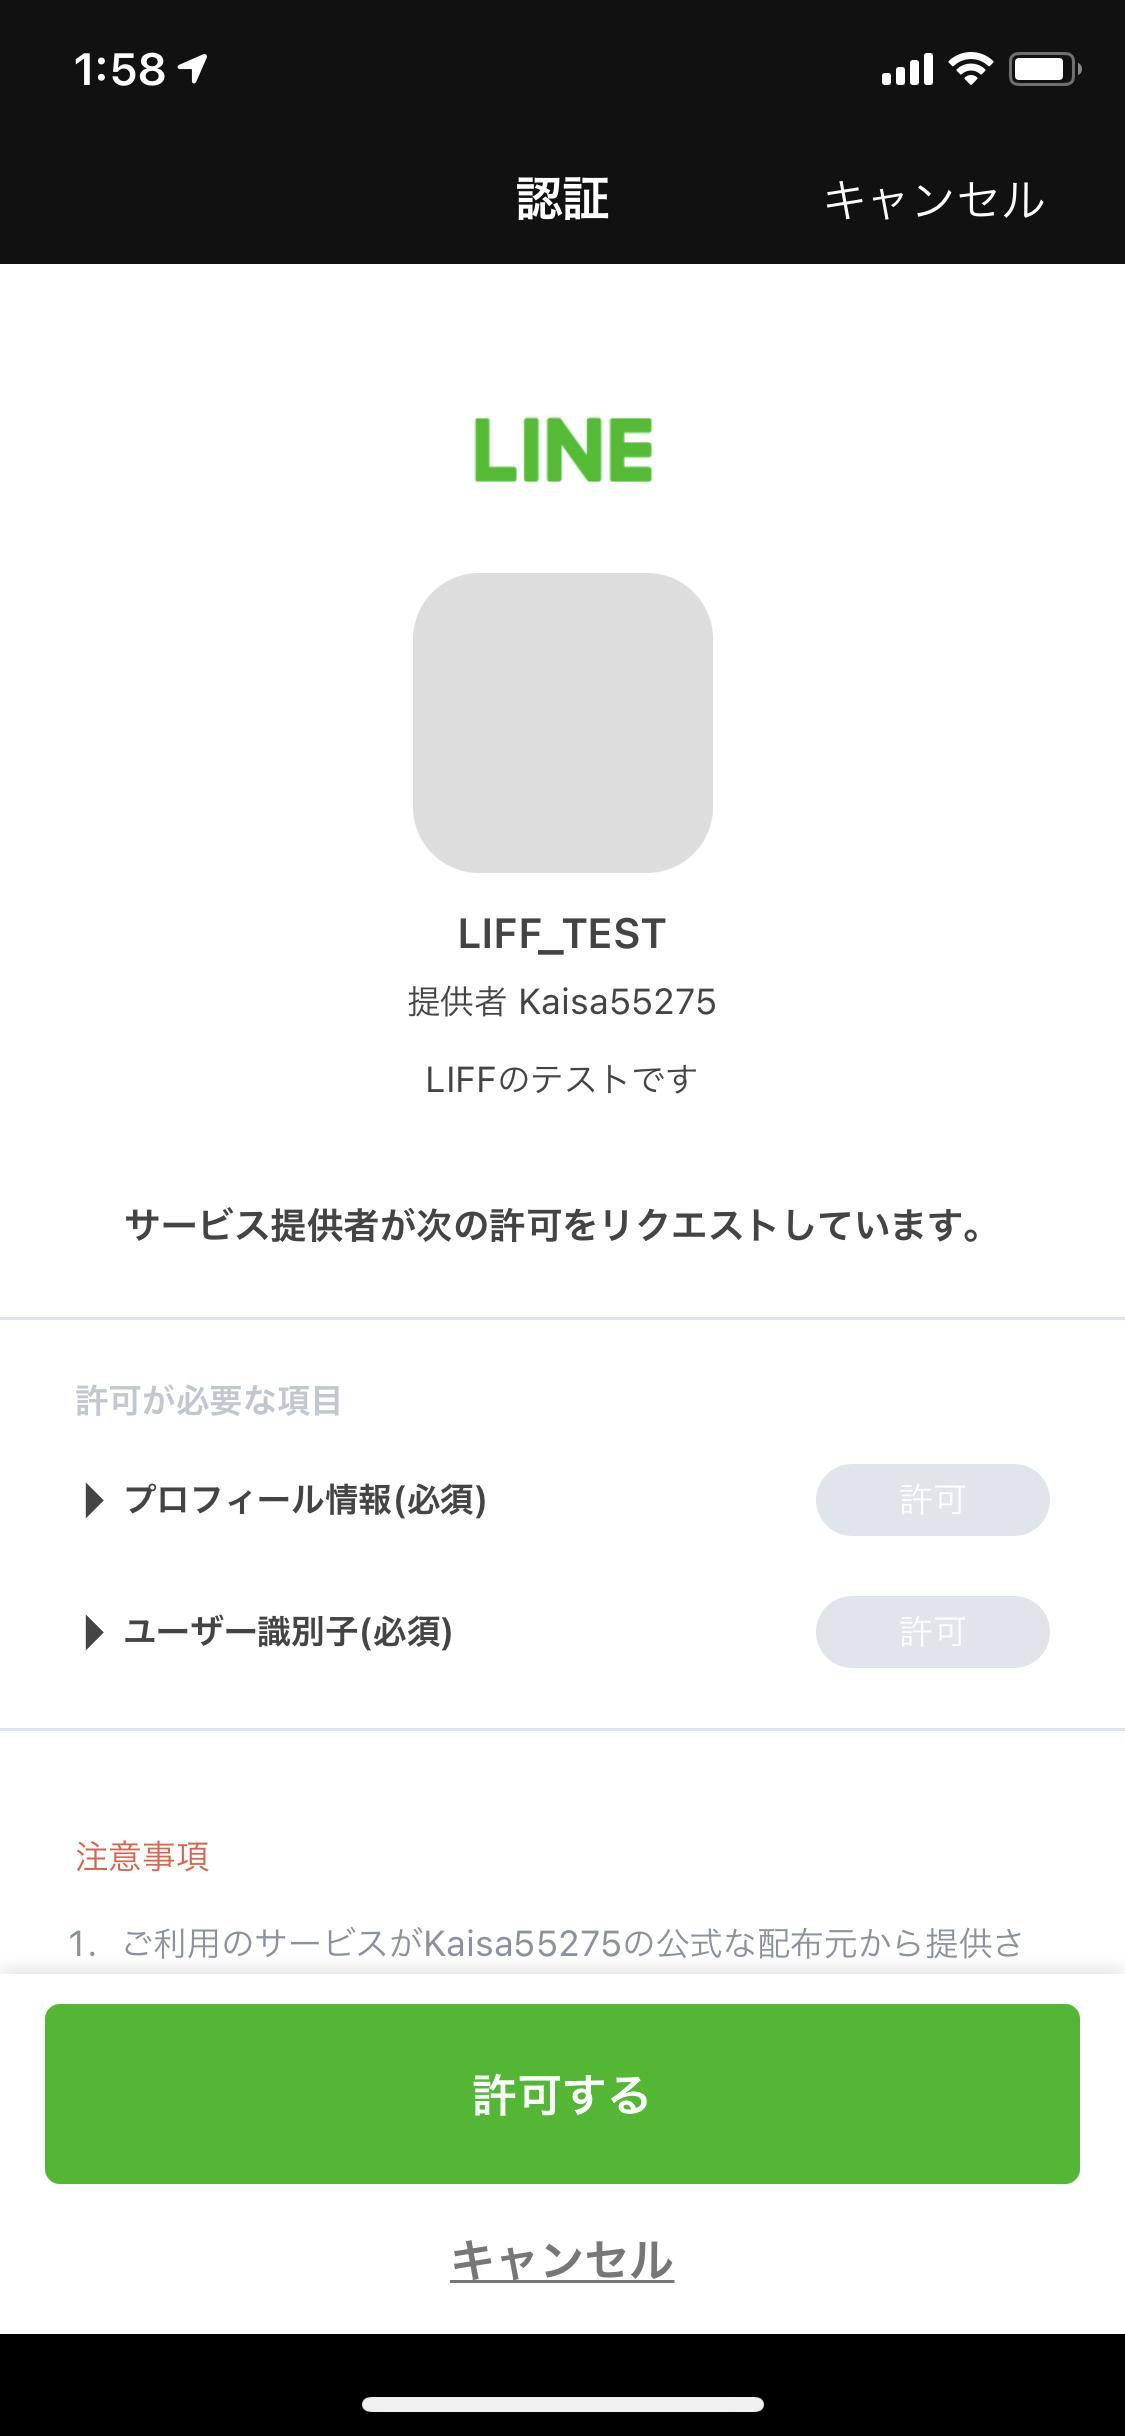 https://res.cloudinary.com/dw86z2fnr/image/upload/v1620383436/titanicrising.jp/vue-liff/IMG_2067_mzvia4.png